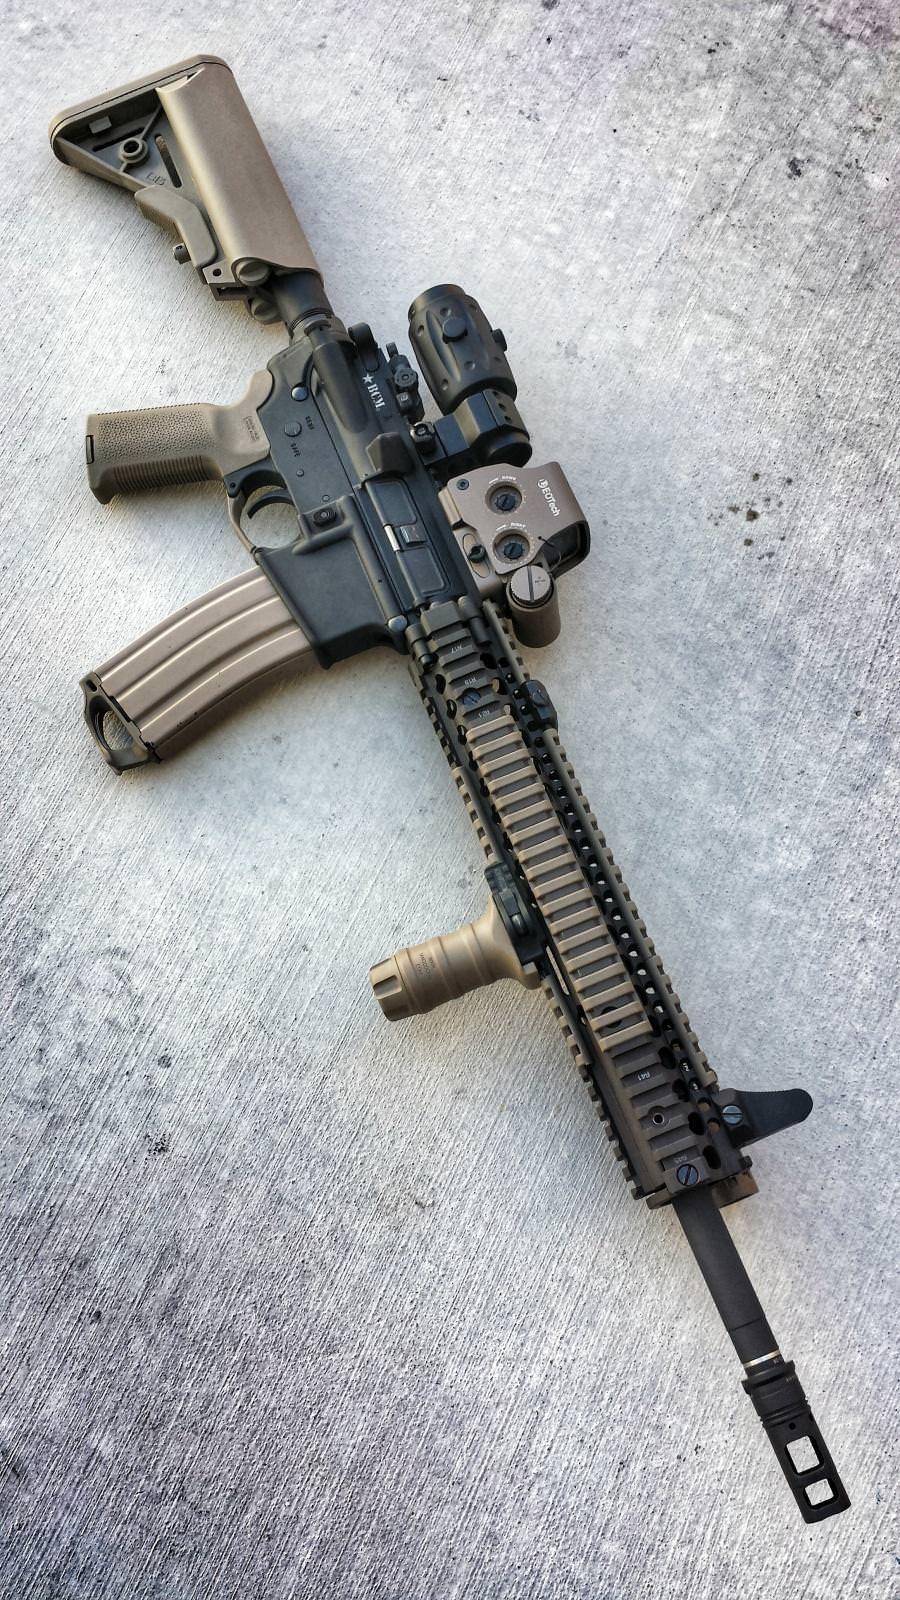 weapon gun security offense military war equipment steel army danger machine